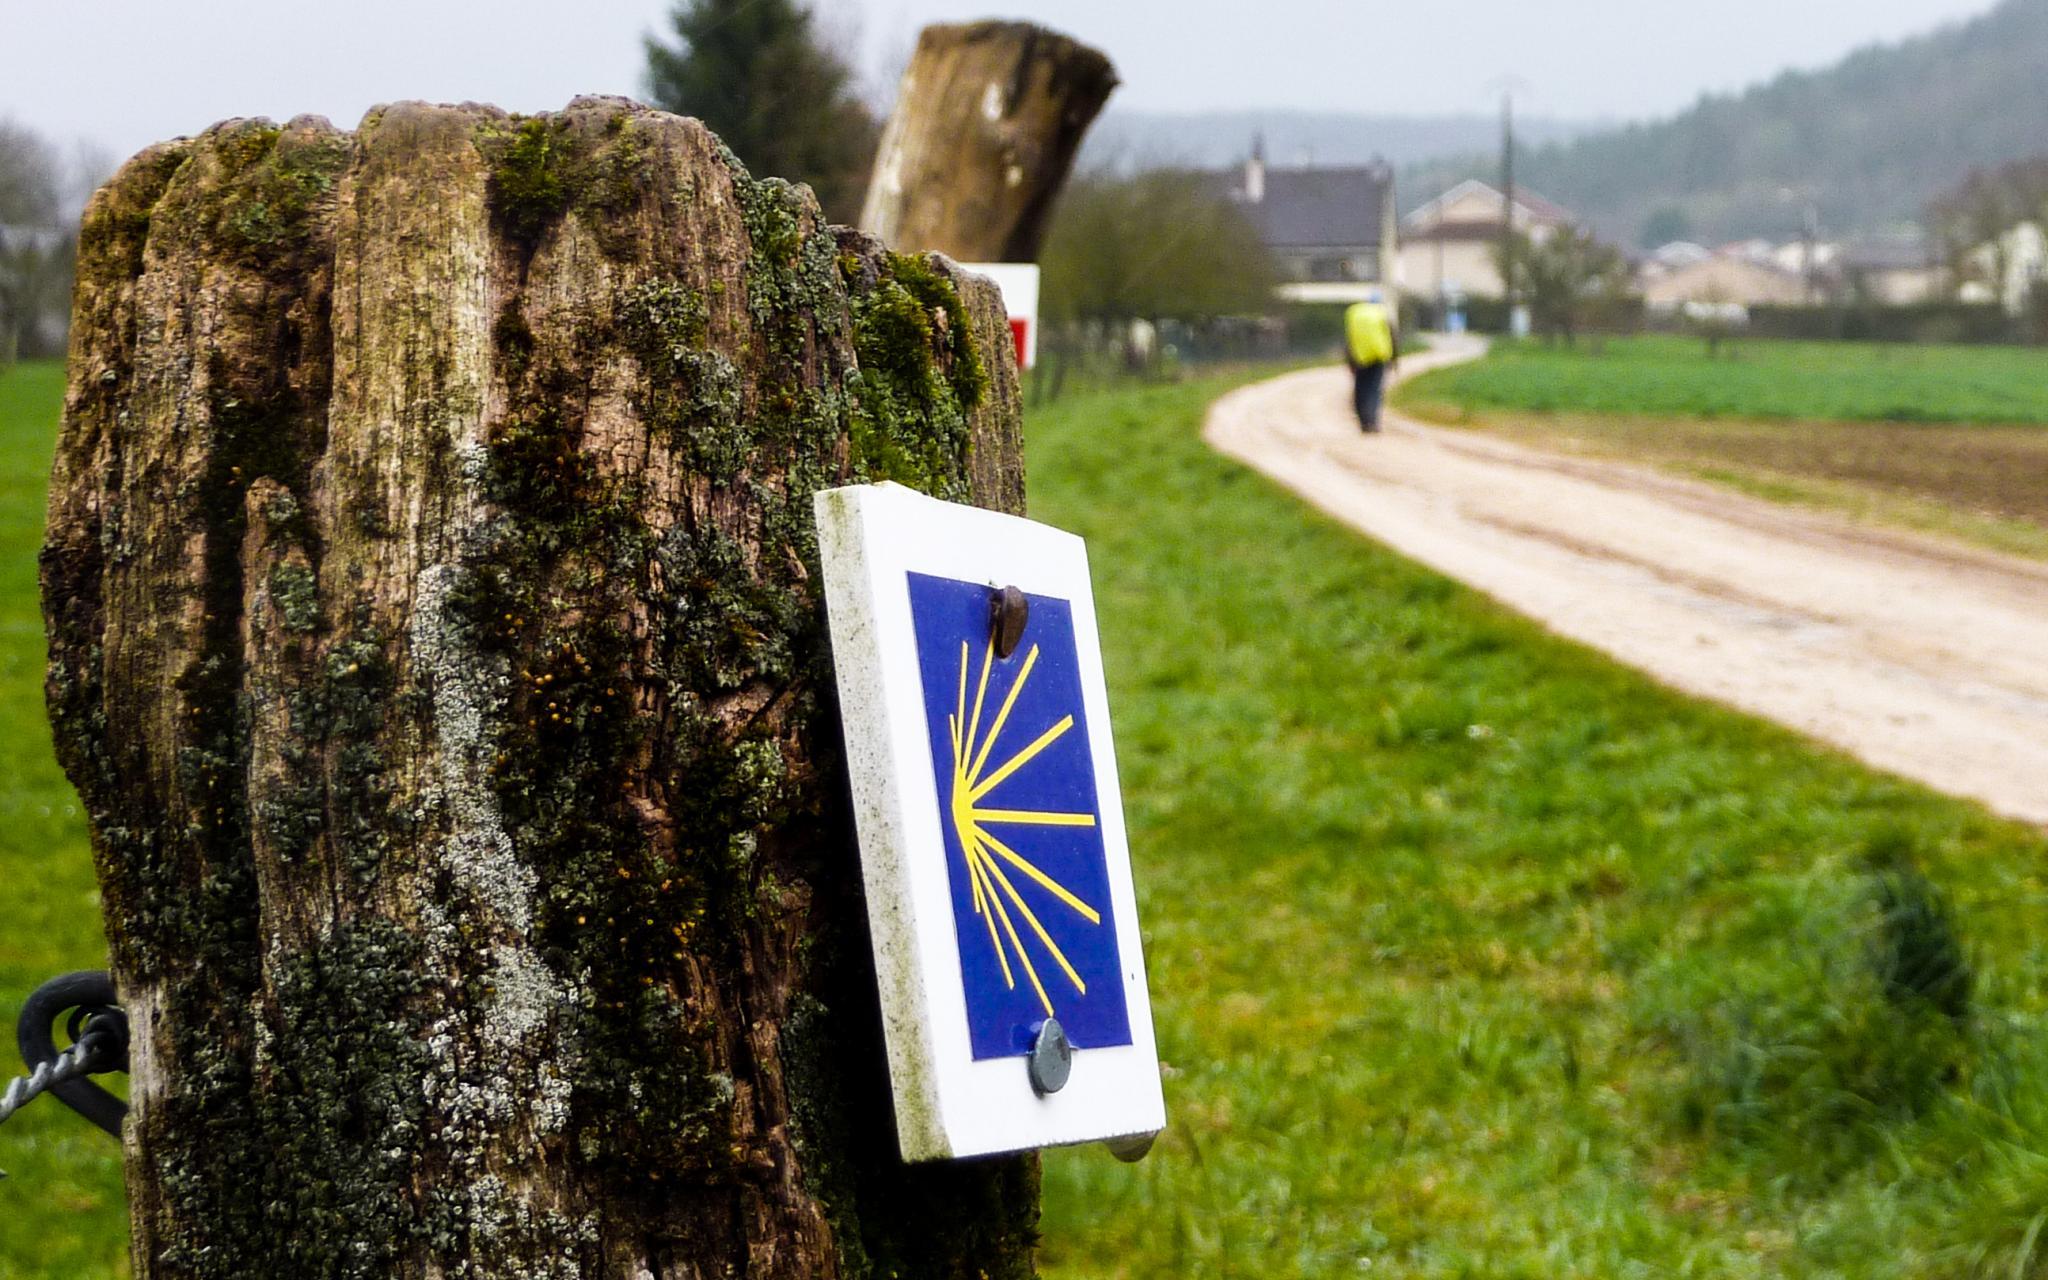 Jakobsweg Taillancourt Wegweiser am Zaunpfahl